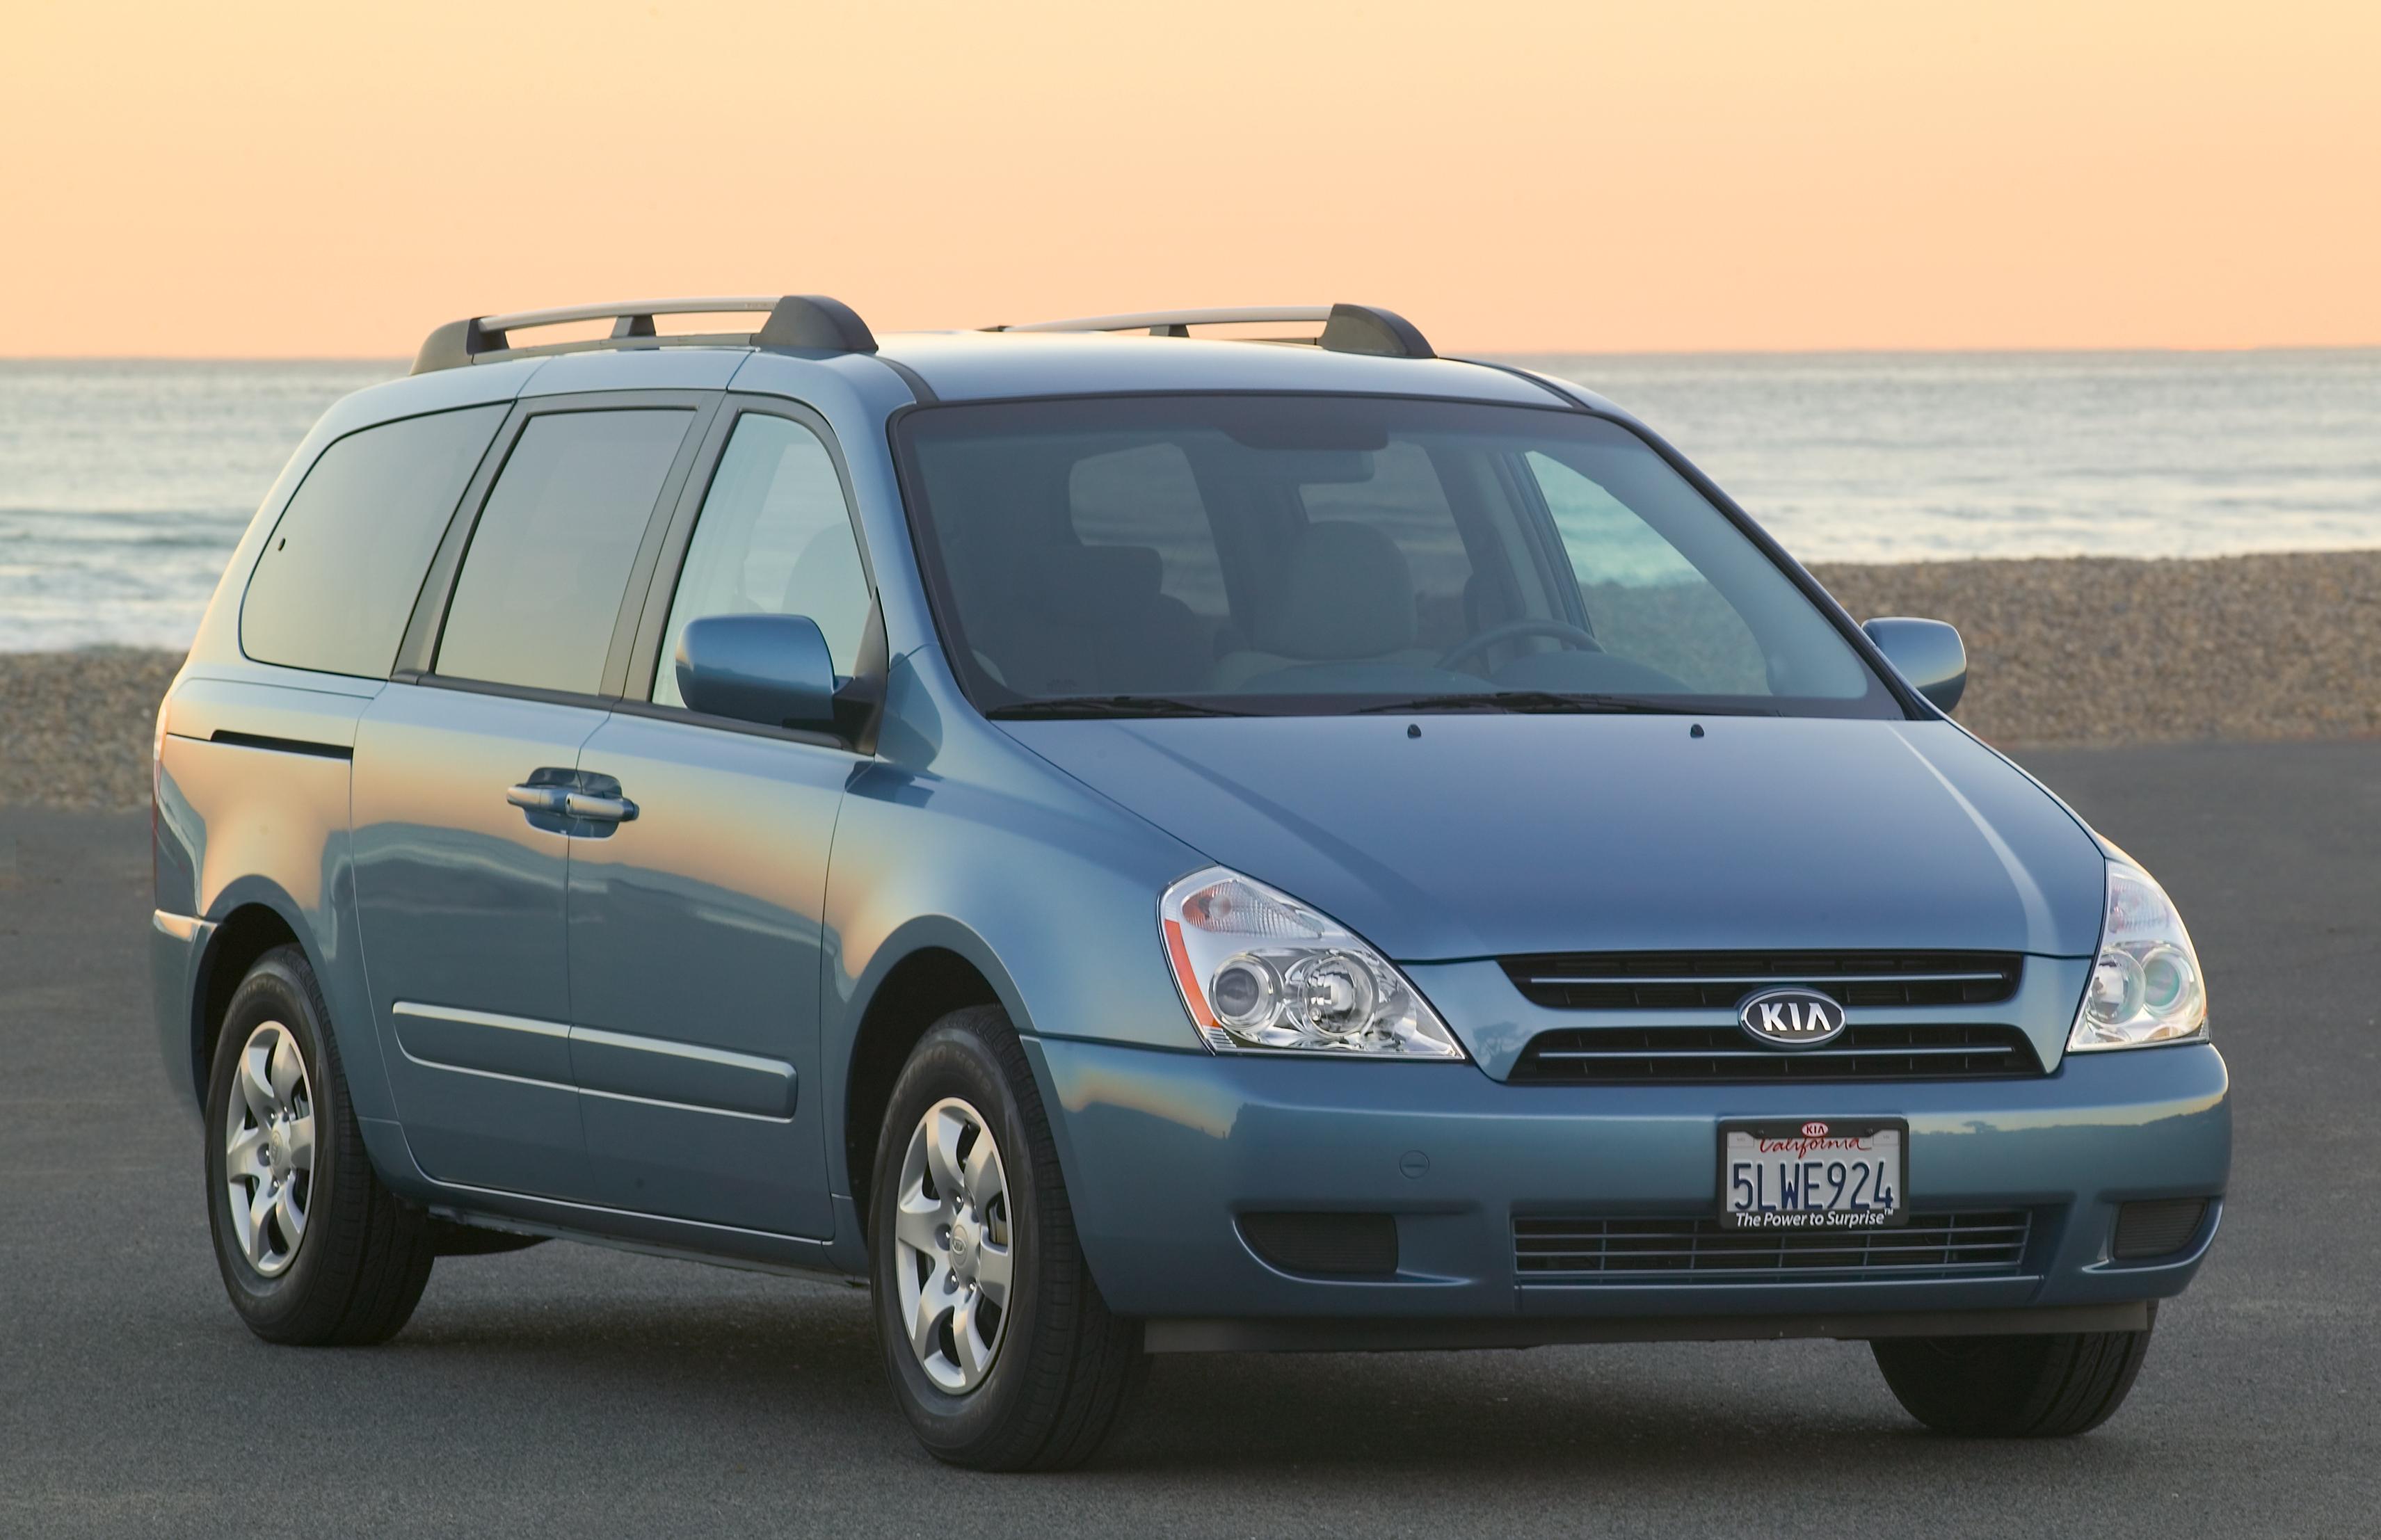 sedona for vehicle hate multipurpose who used pin minivans a kia people